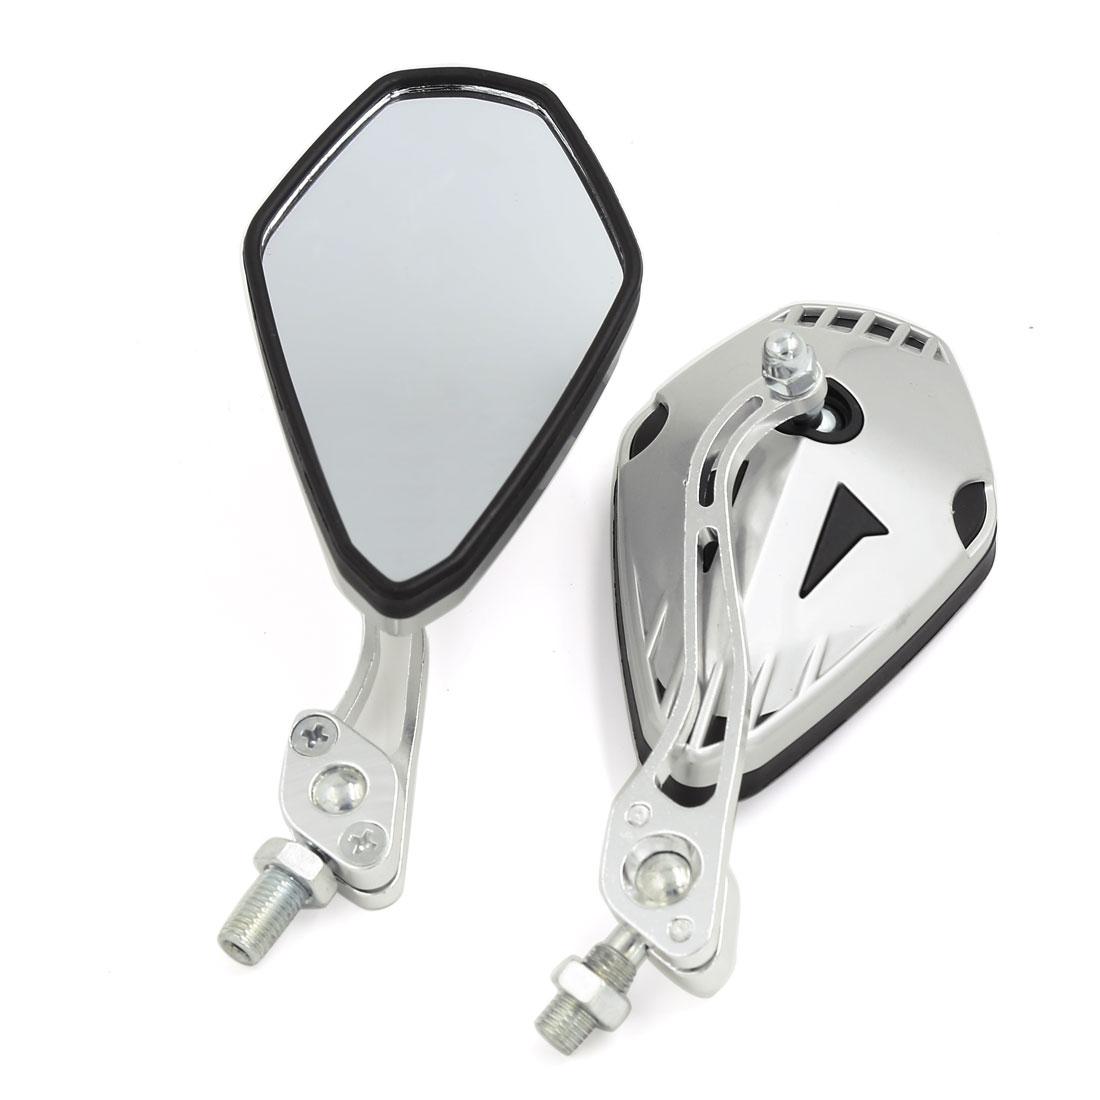 Universal 8mm 10mm Thread Dia Pentagon Shape Motorcycle Side Rearview Mirror Pair